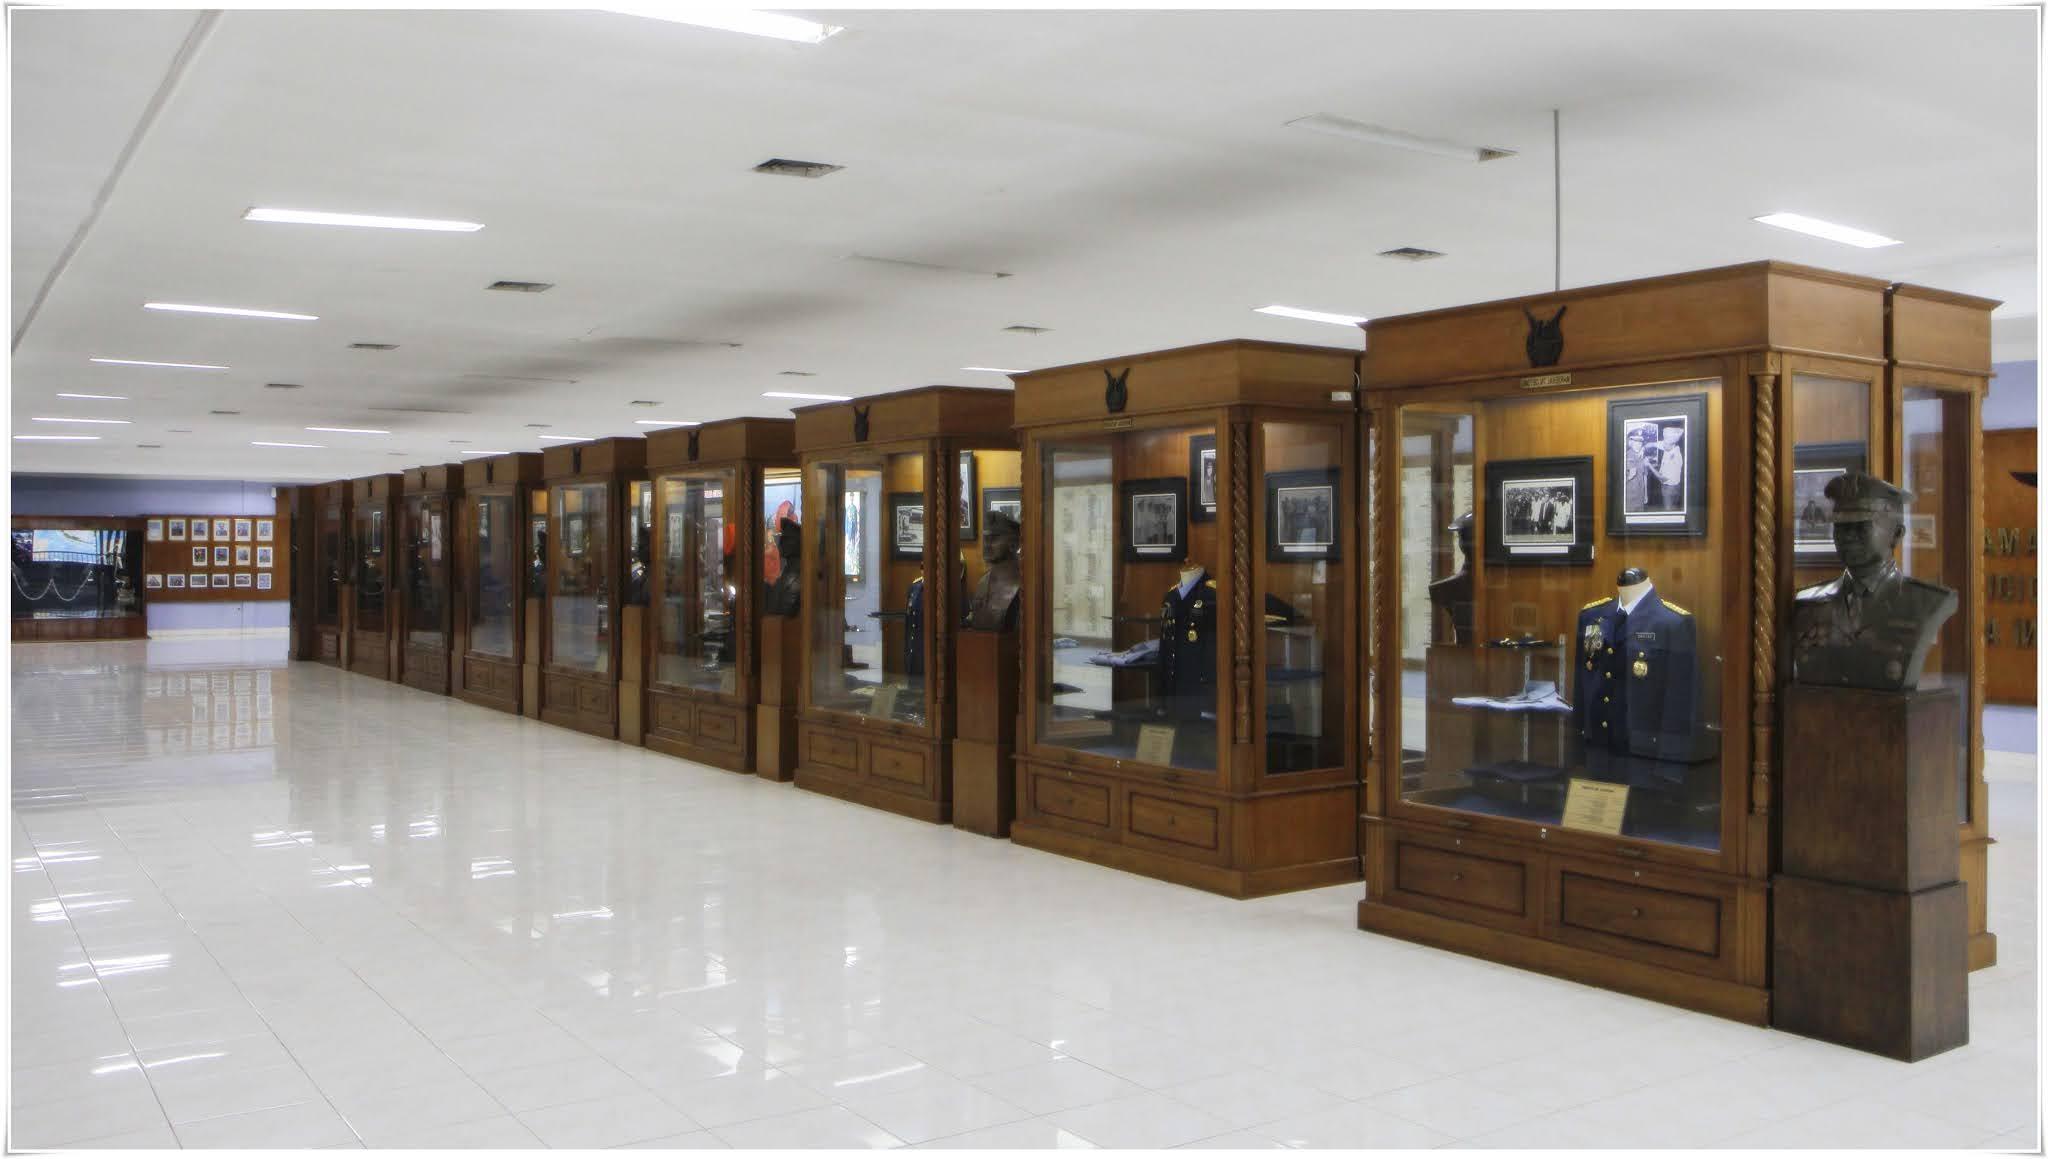 Gambar Pakaian Dinas Di Wisata Museum Dirgantara Bantul